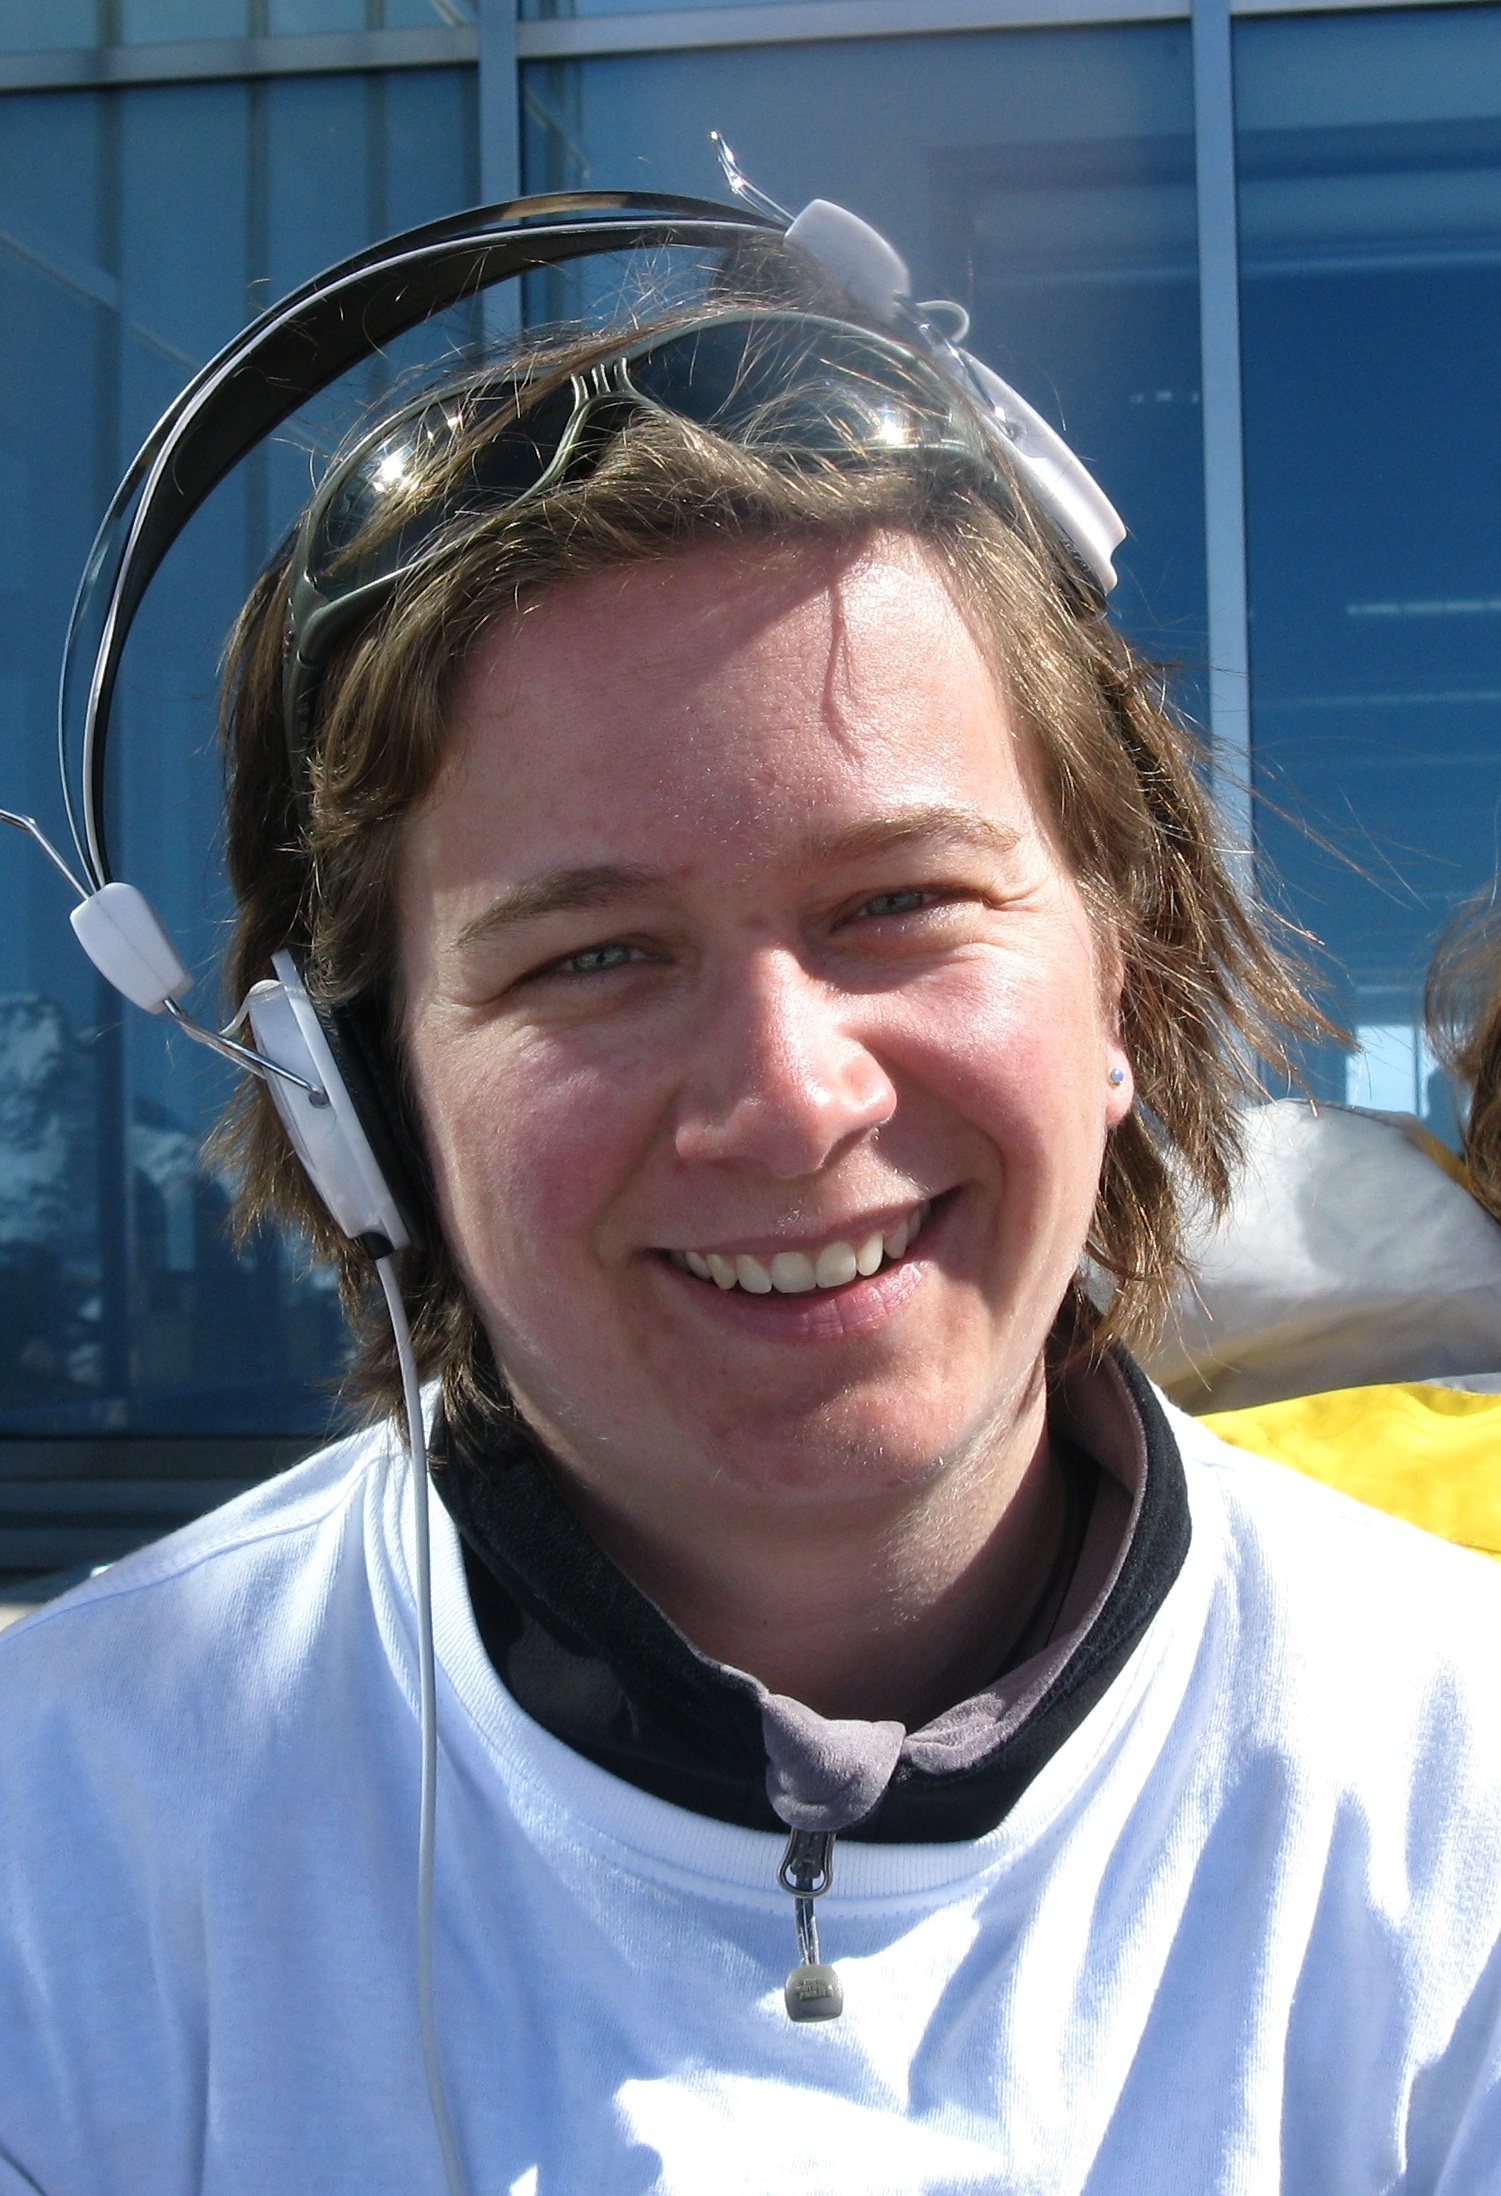 Katrin Mehlo